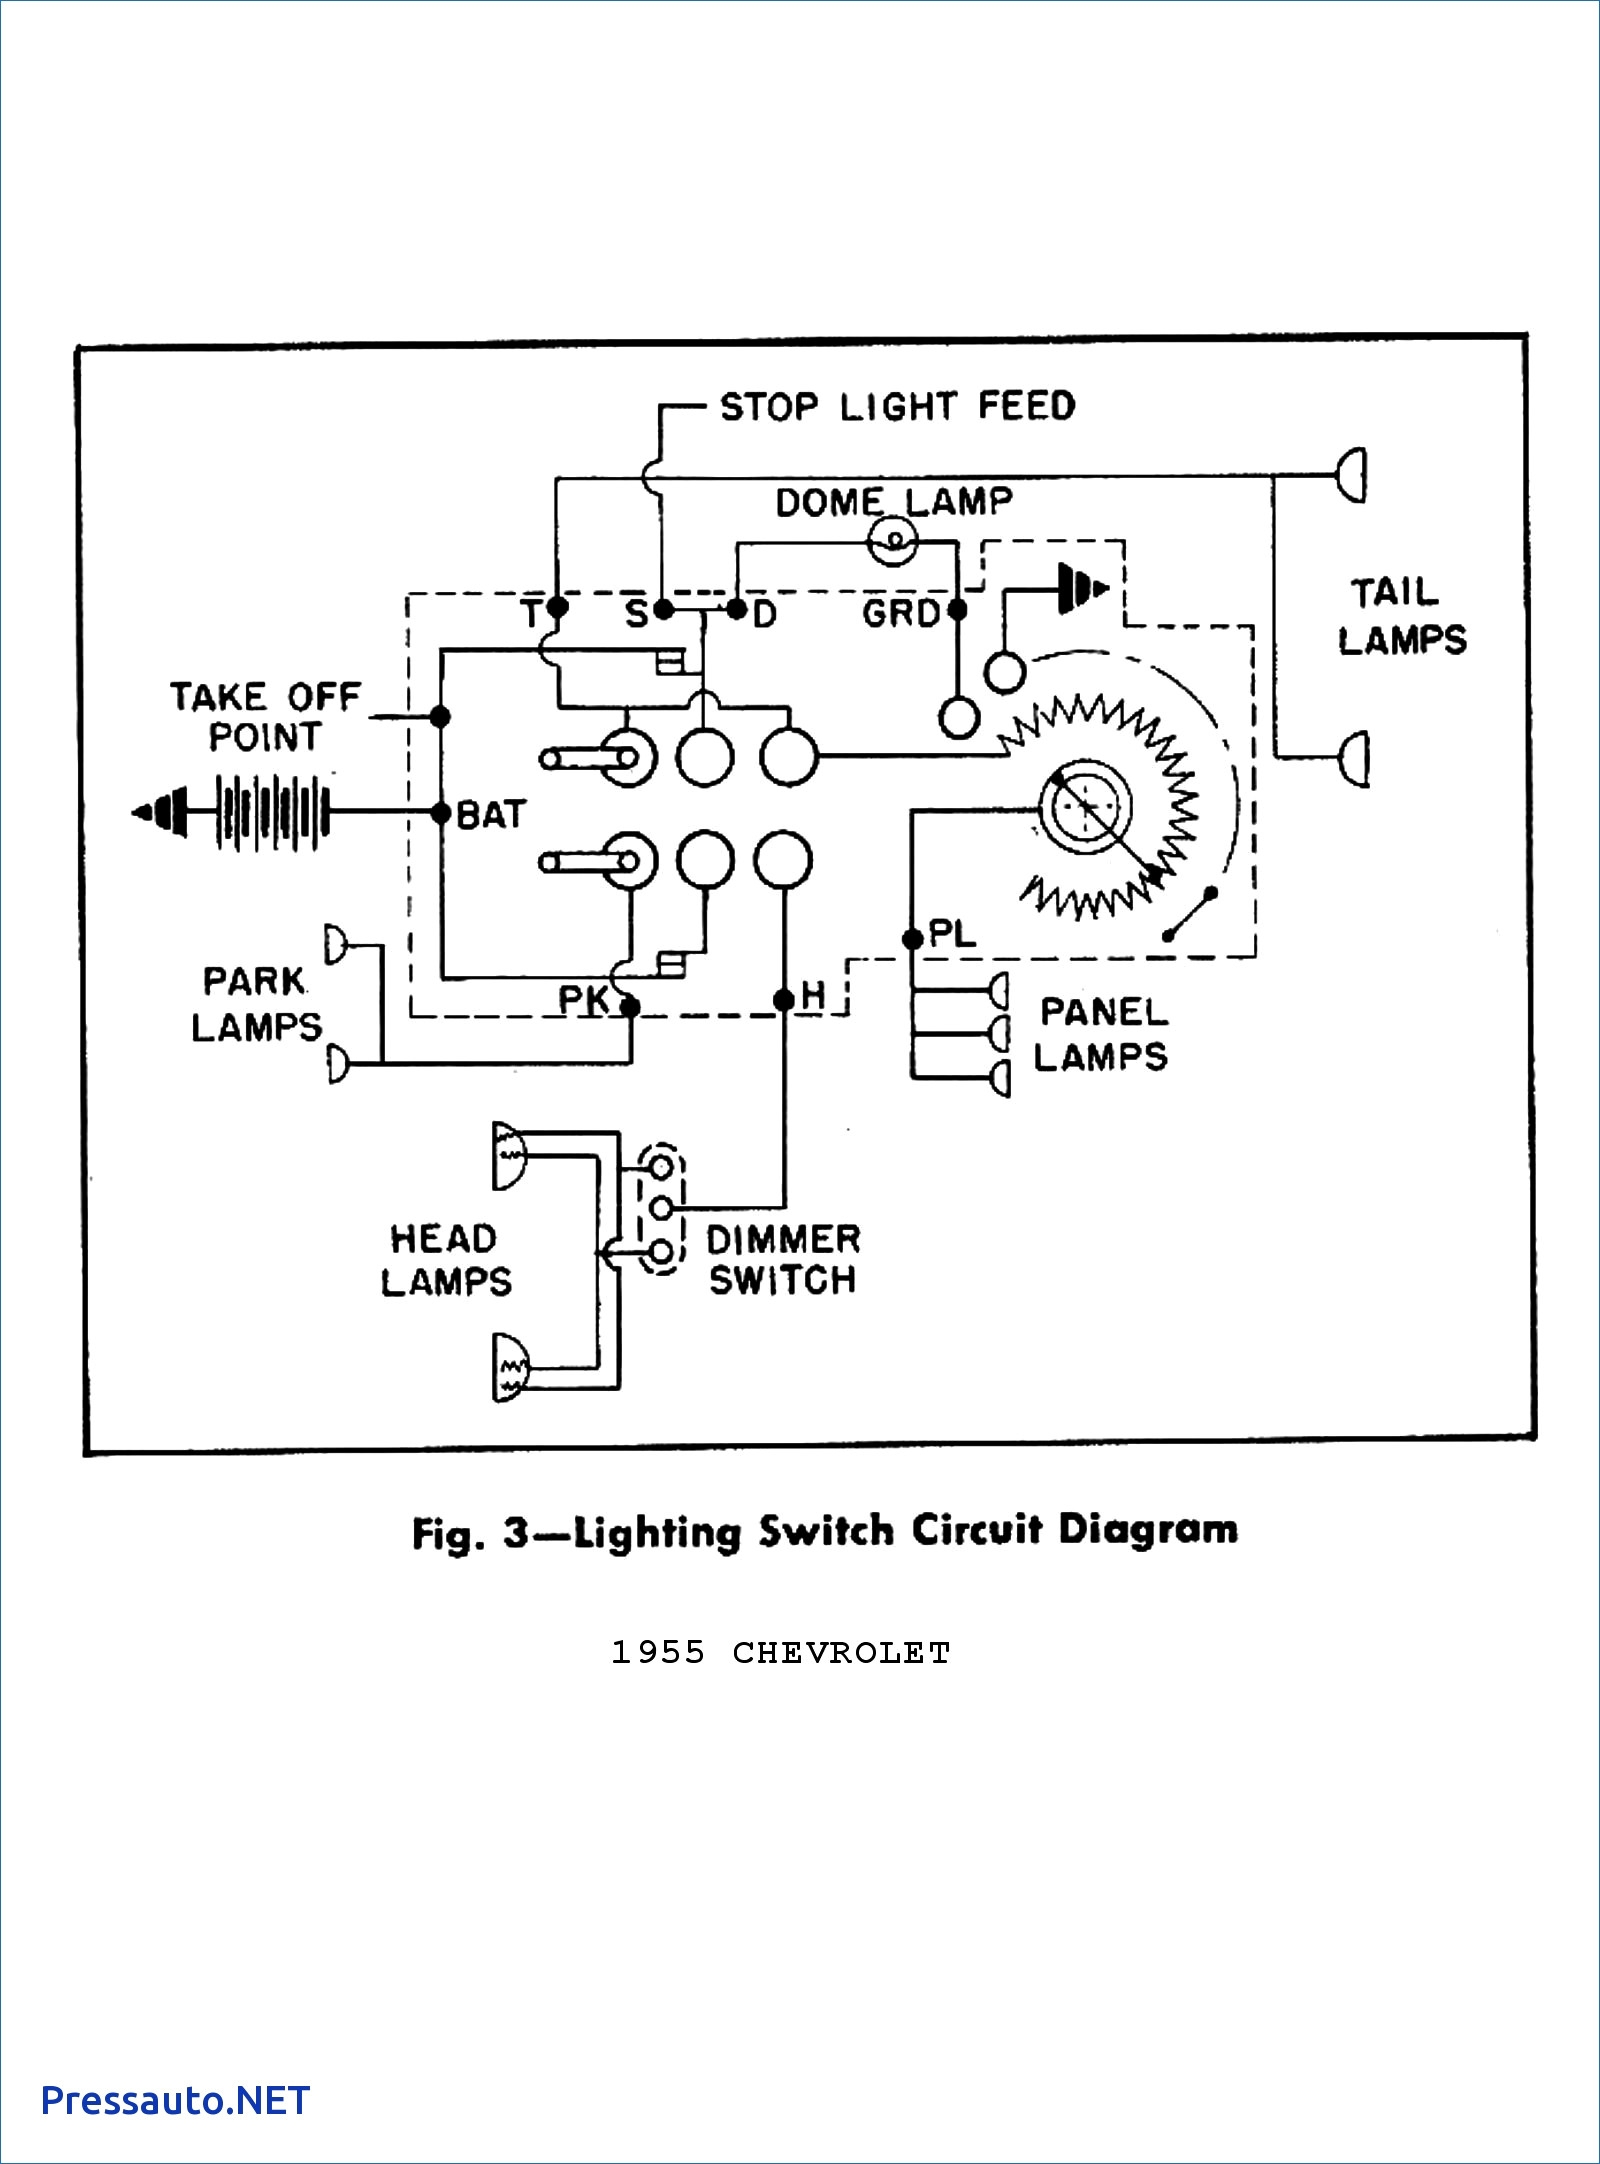 Jl Audio 12w6v2 Wiring Diagram